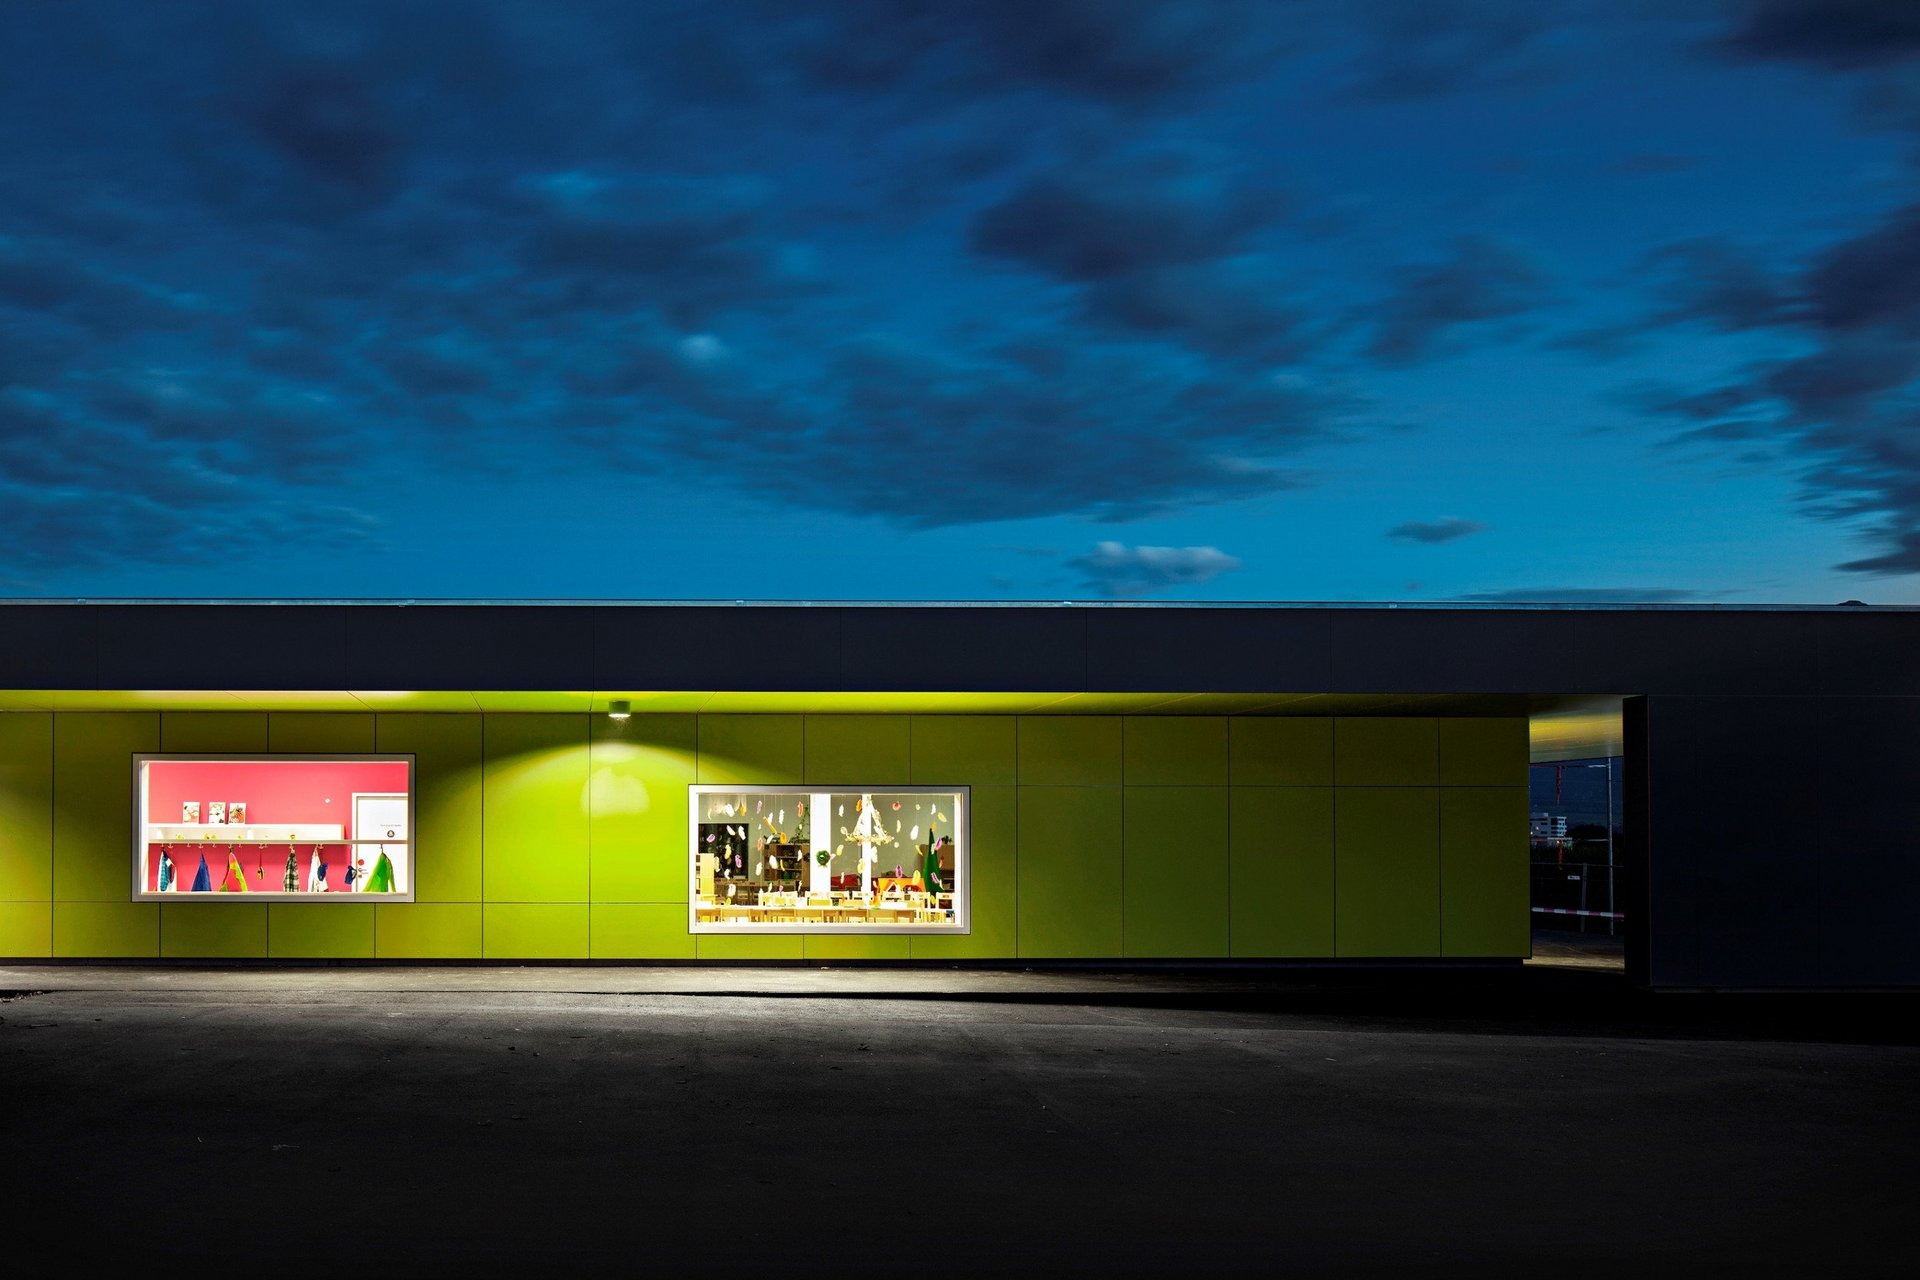 1-geschossiger Kindergarten mit Rockpanelfassade in grün